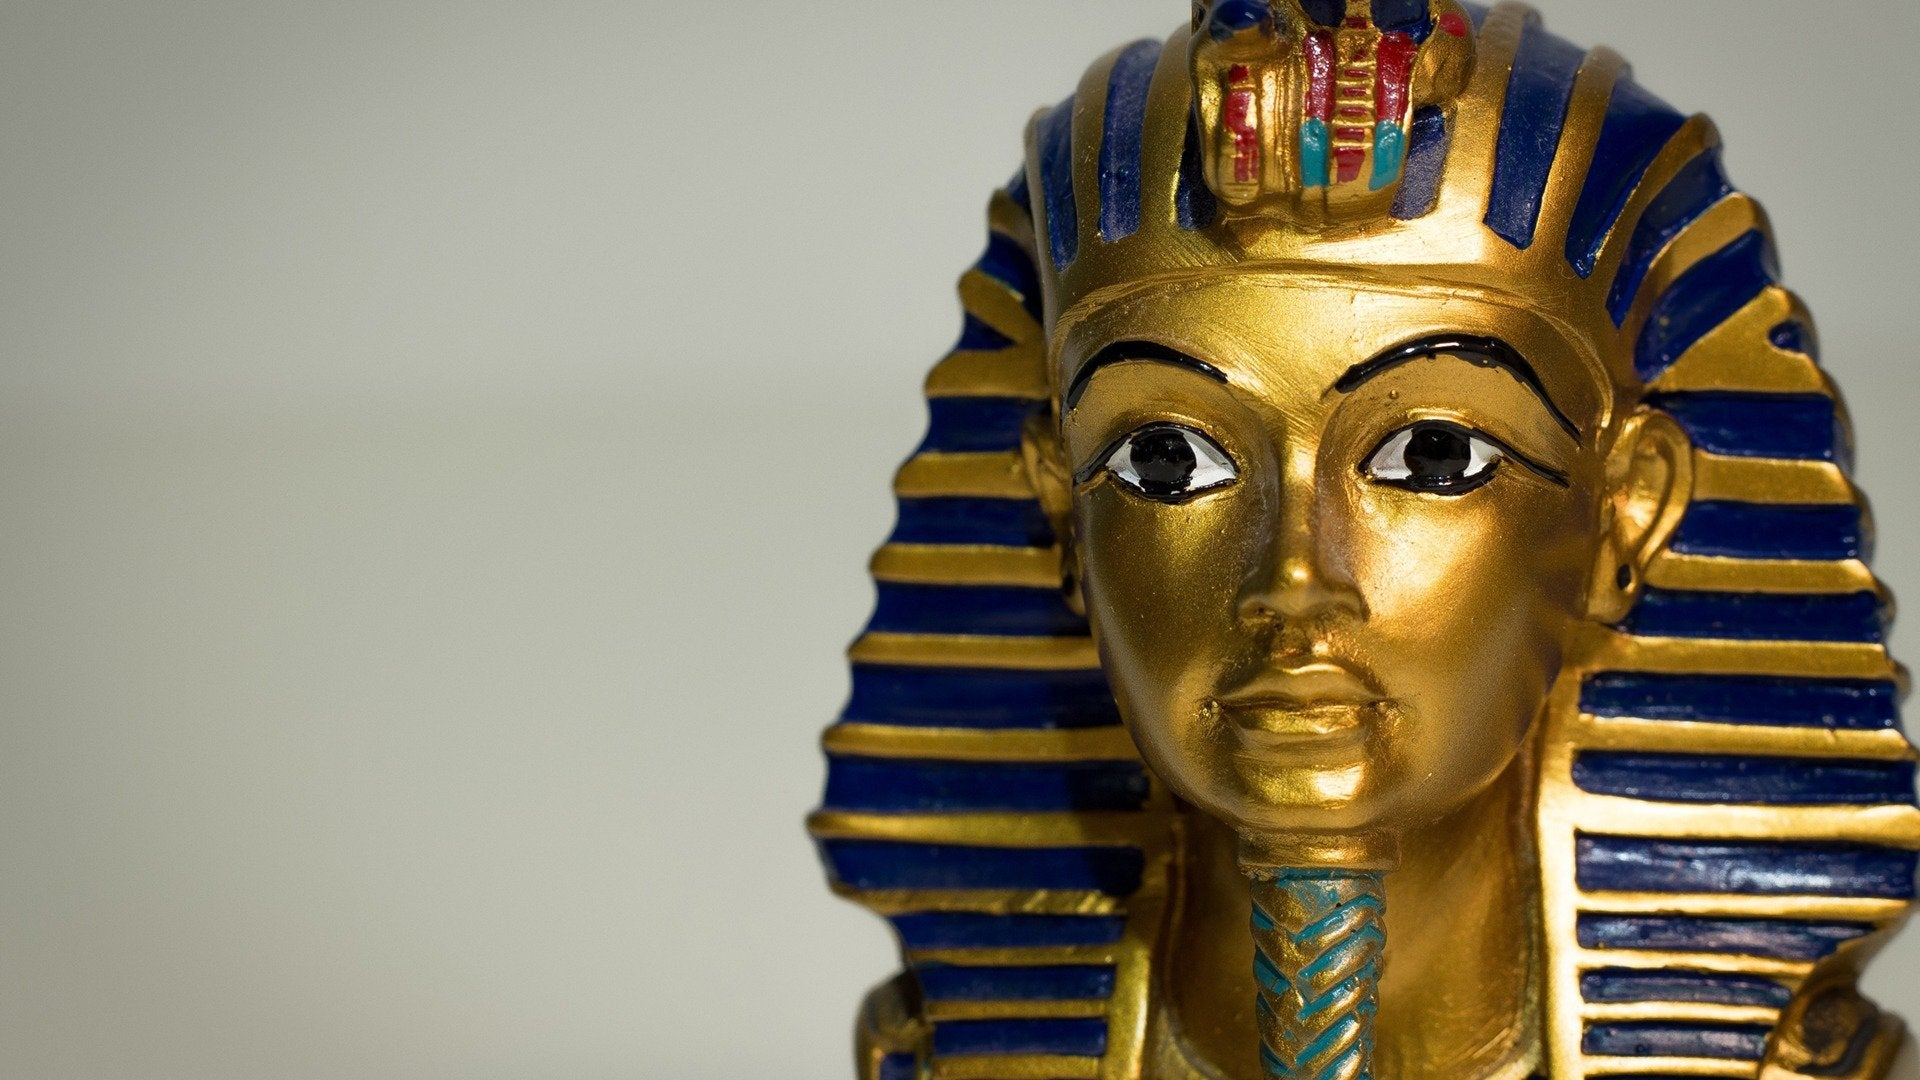 Egypt's Greatest Mysteries